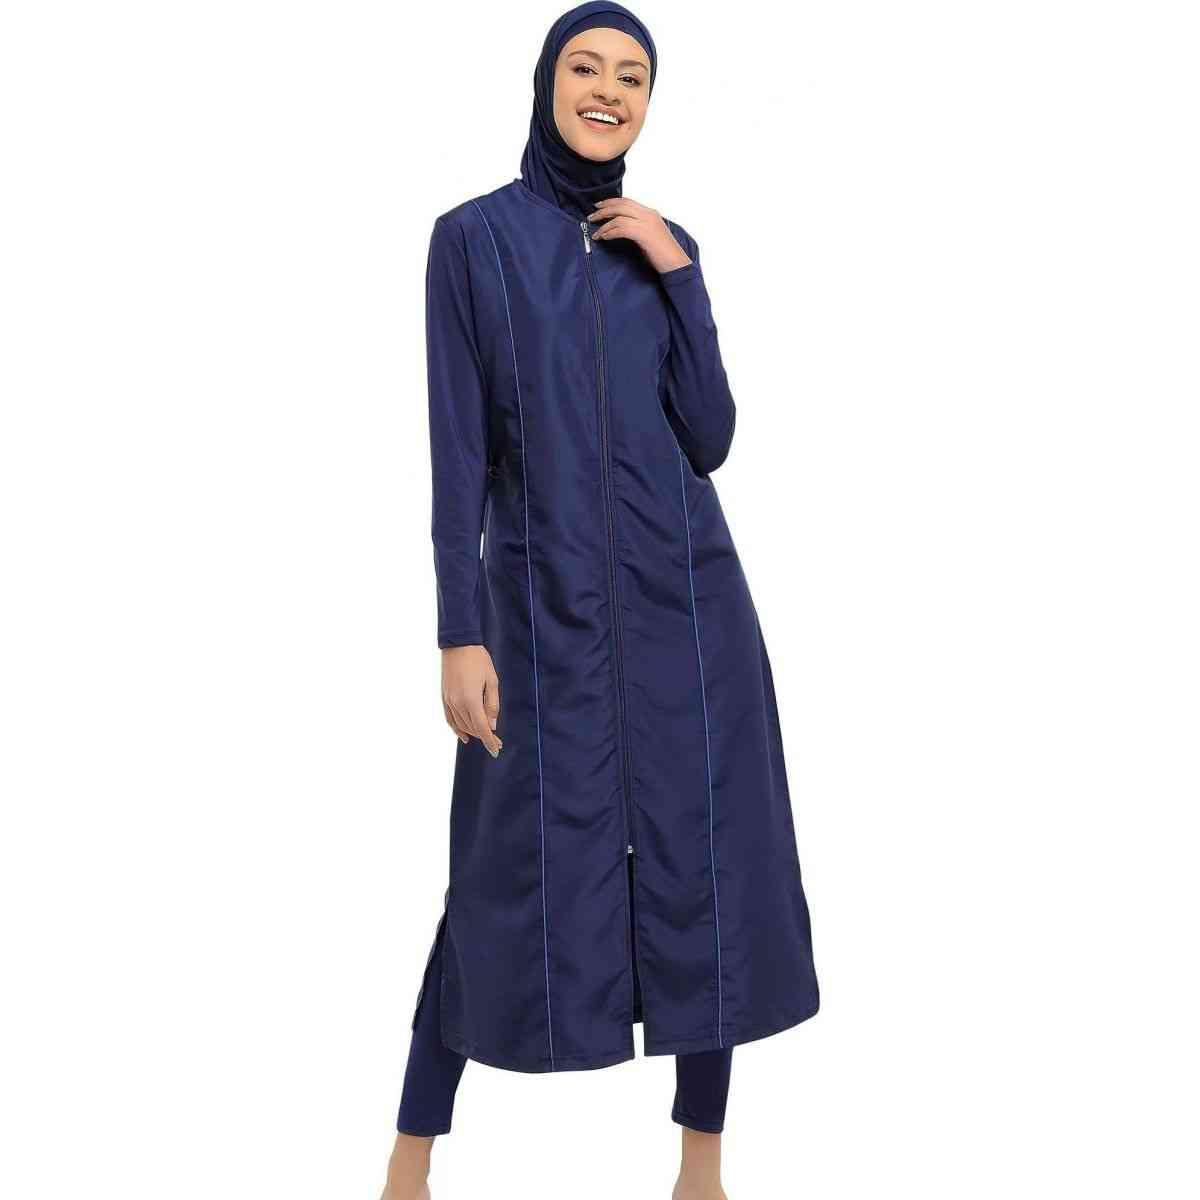 Long Micro Sleeves Burkini Muslim Swimwear Hijab Islamic Swimsuit Fashion Women Full Cover